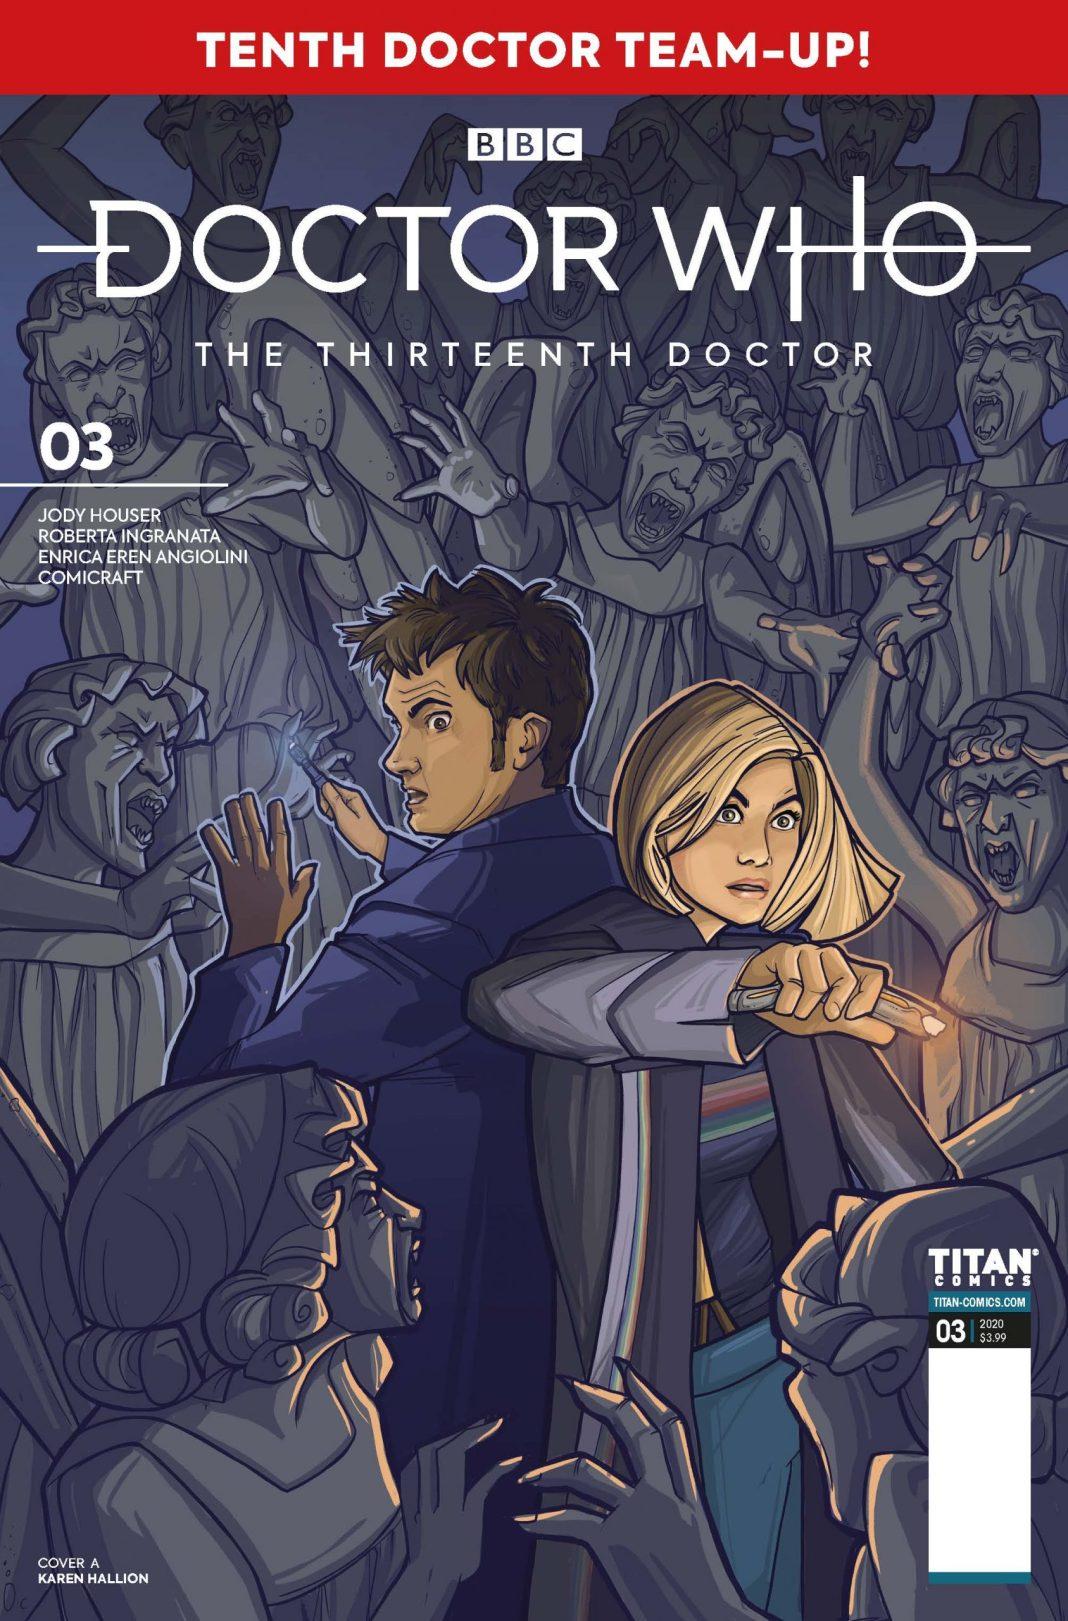 Titan Comics – Doctor Who: The Thirteenth Doctor: Season Two #3 – Cover A: Karen Hallion